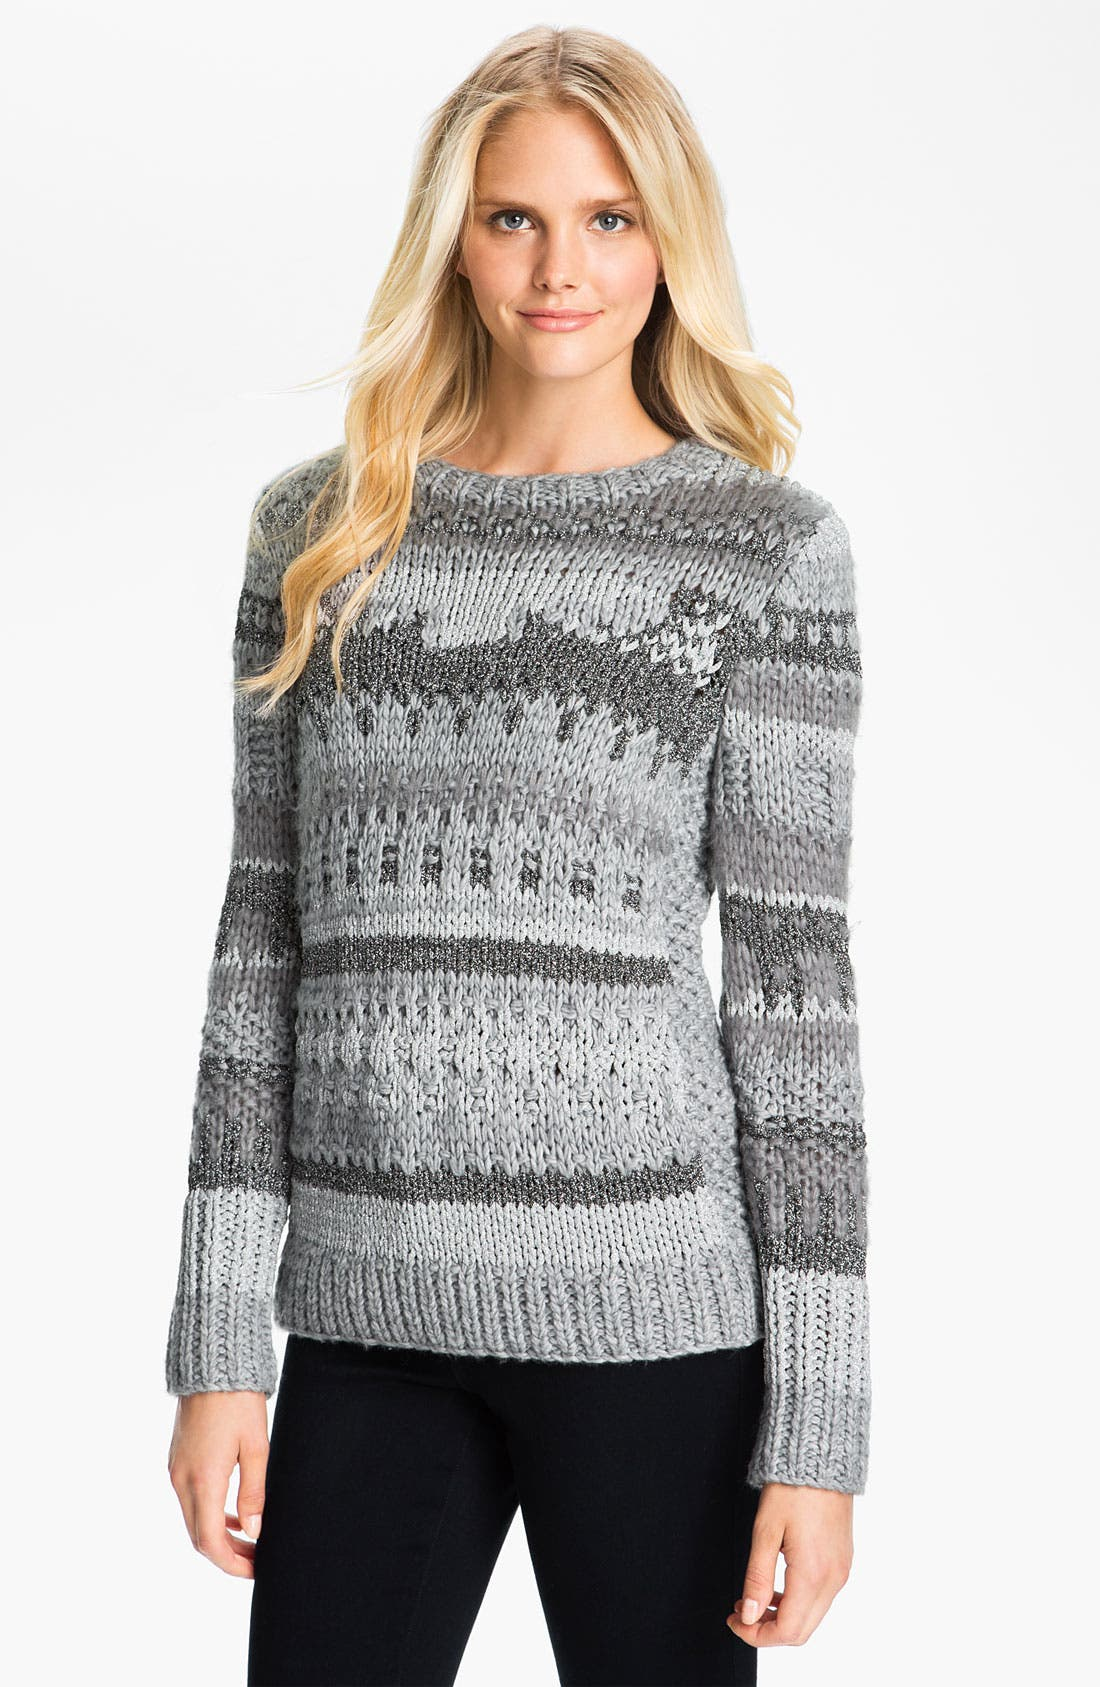 Alternate Image 1 Selected - MICHAEL Michael Kors Textured Intarsia Sweater